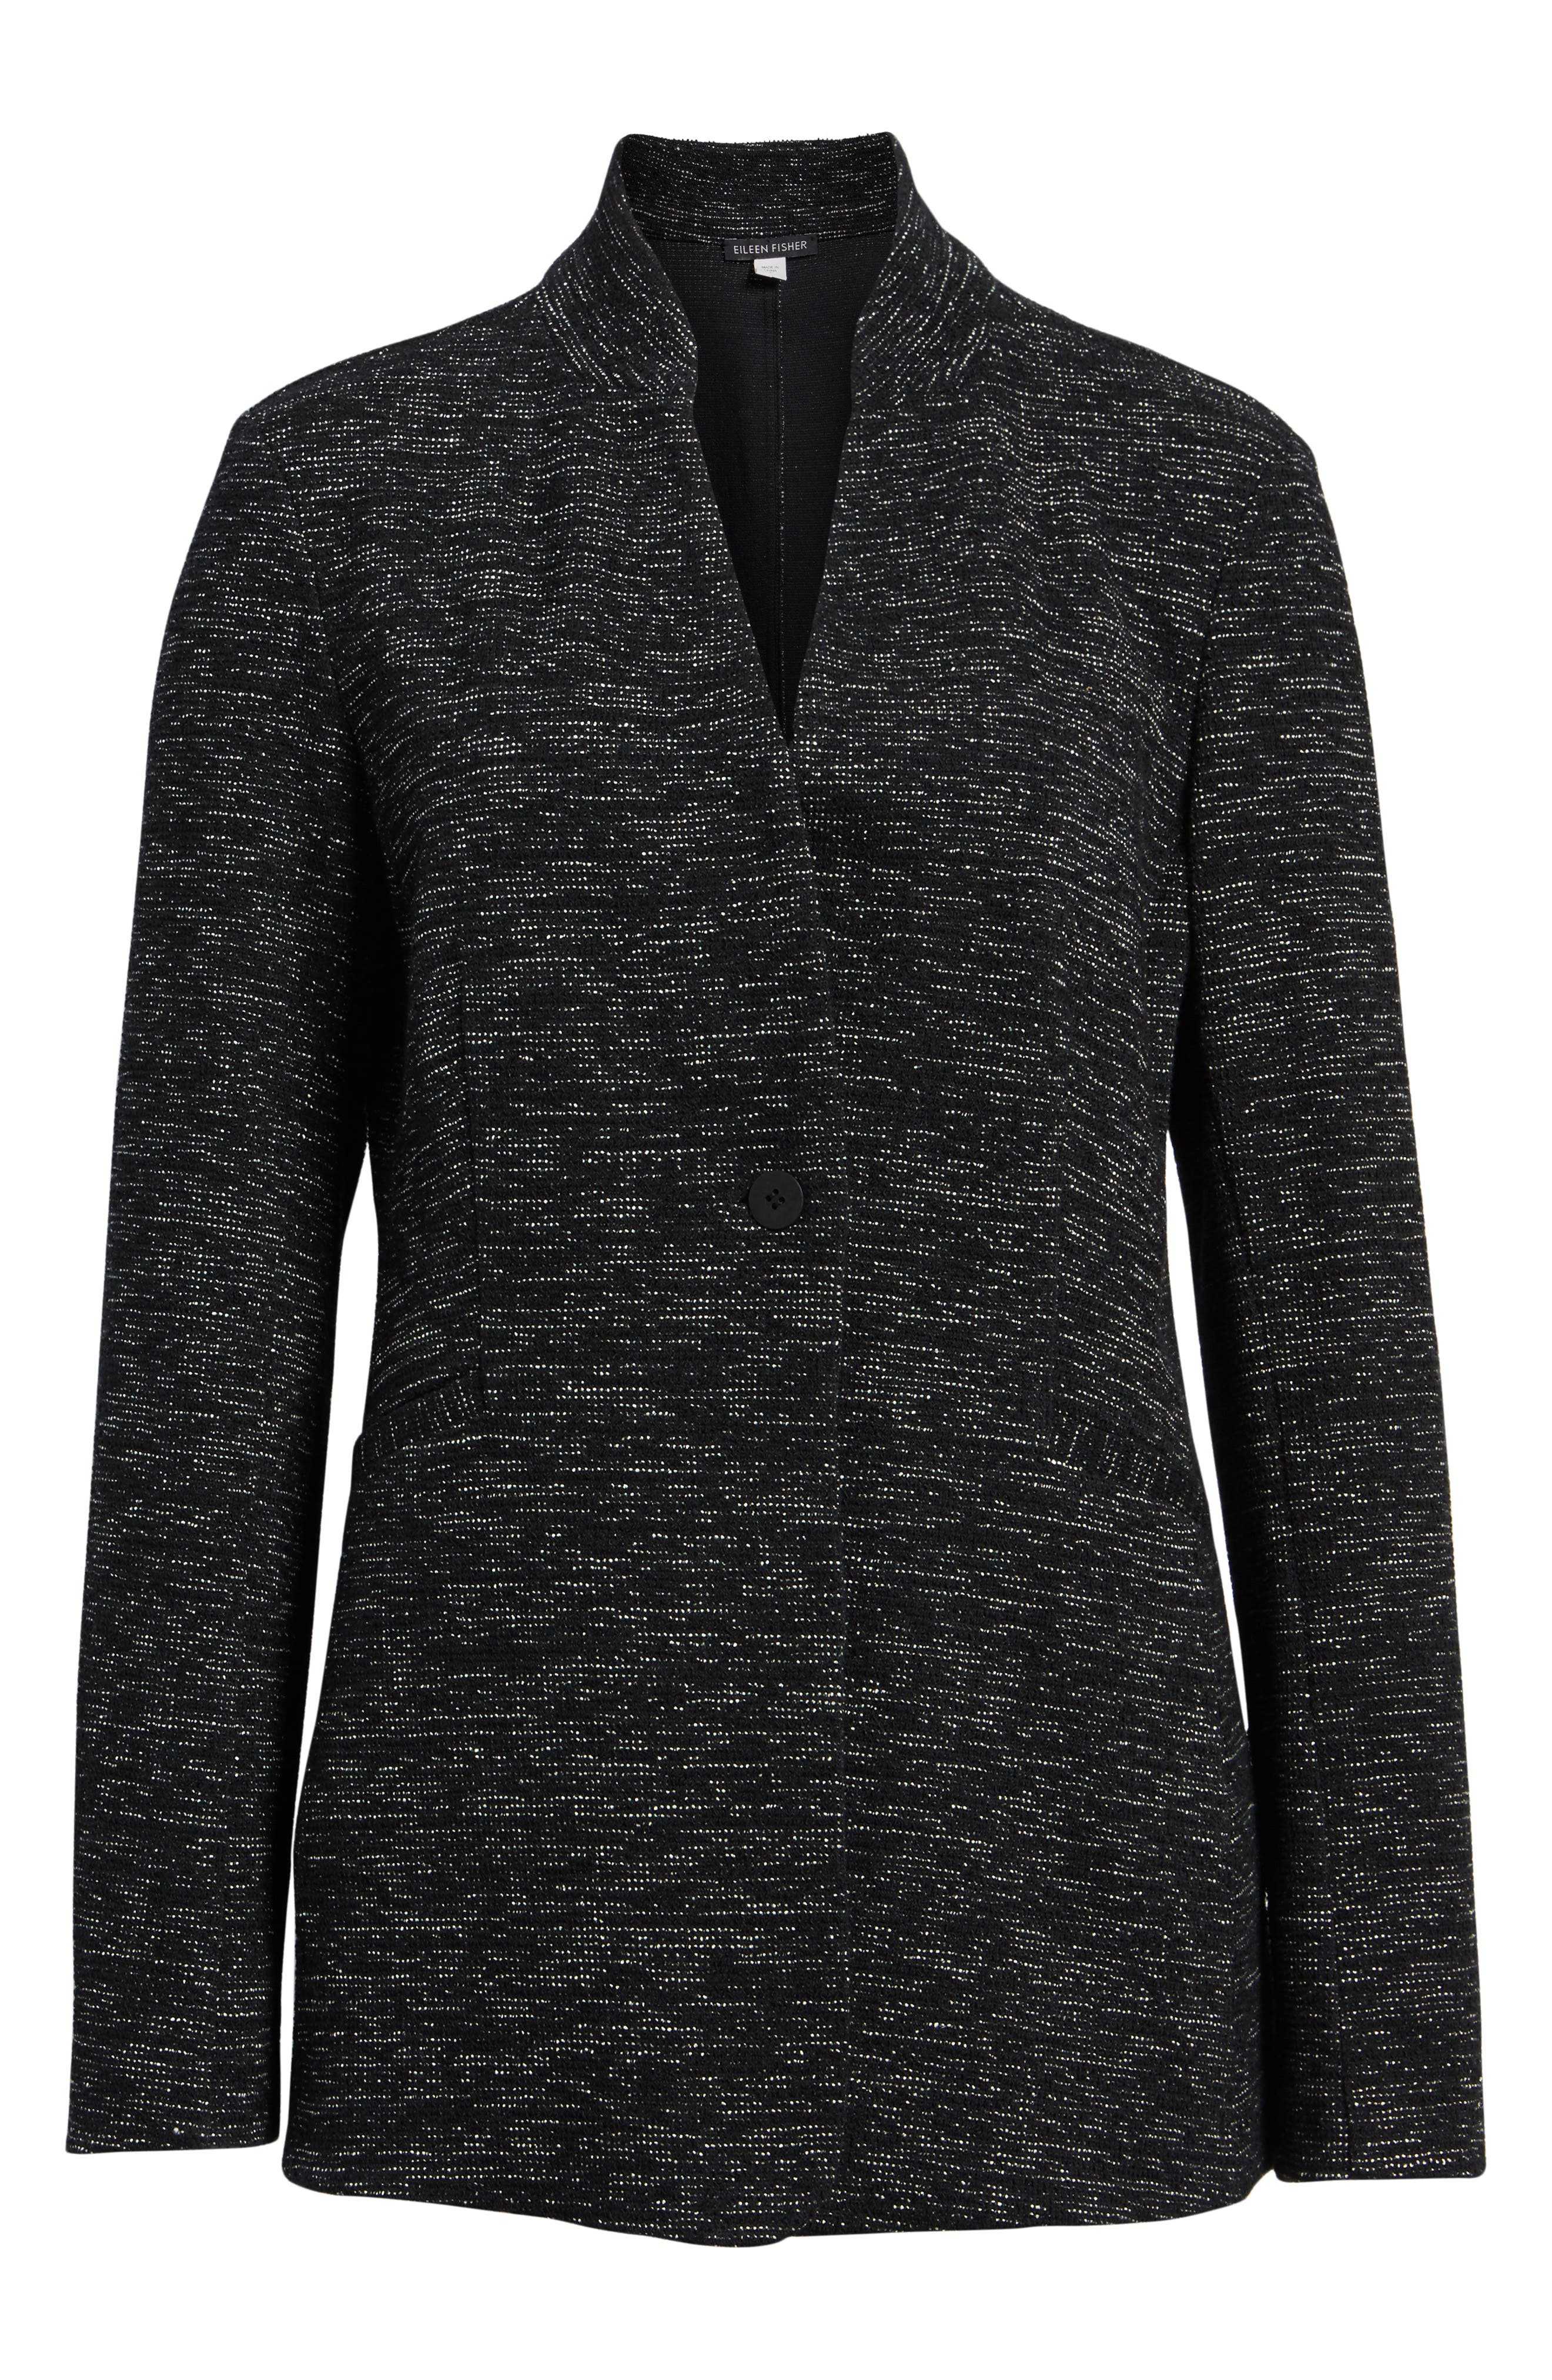 Organic Cotton Blend Tweed Jacket,                             Alternate thumbnail 5, color,